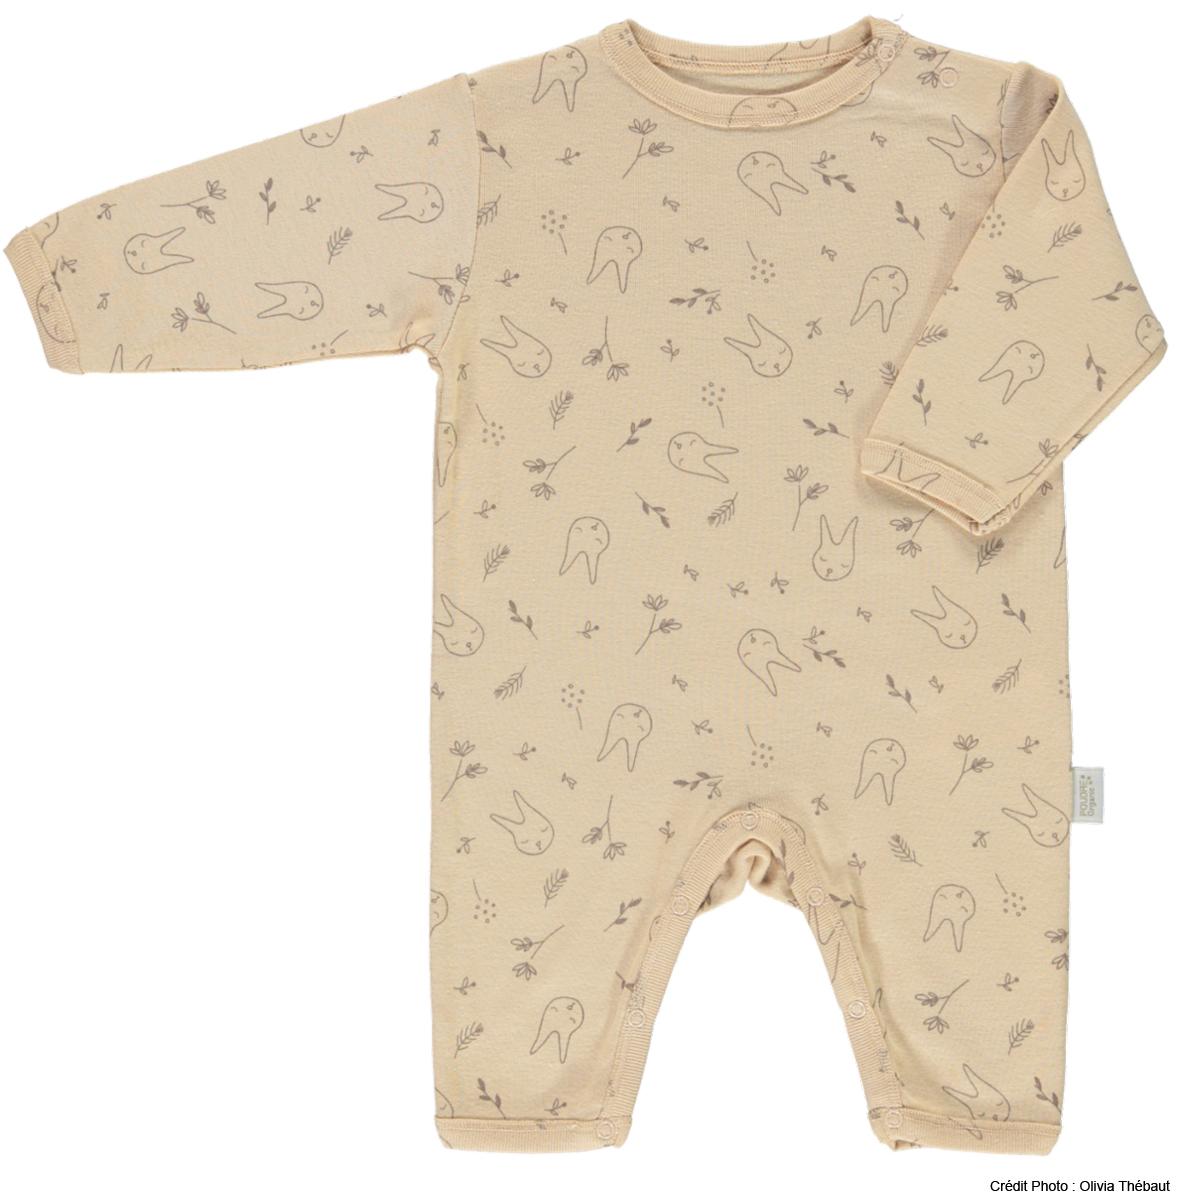 Body et Pyjama Pyjama Armoise Amberlight et Motifs Lapin - 12 mois Pyjama Armoise Amberlight et Motifs Lapin - 12 mois